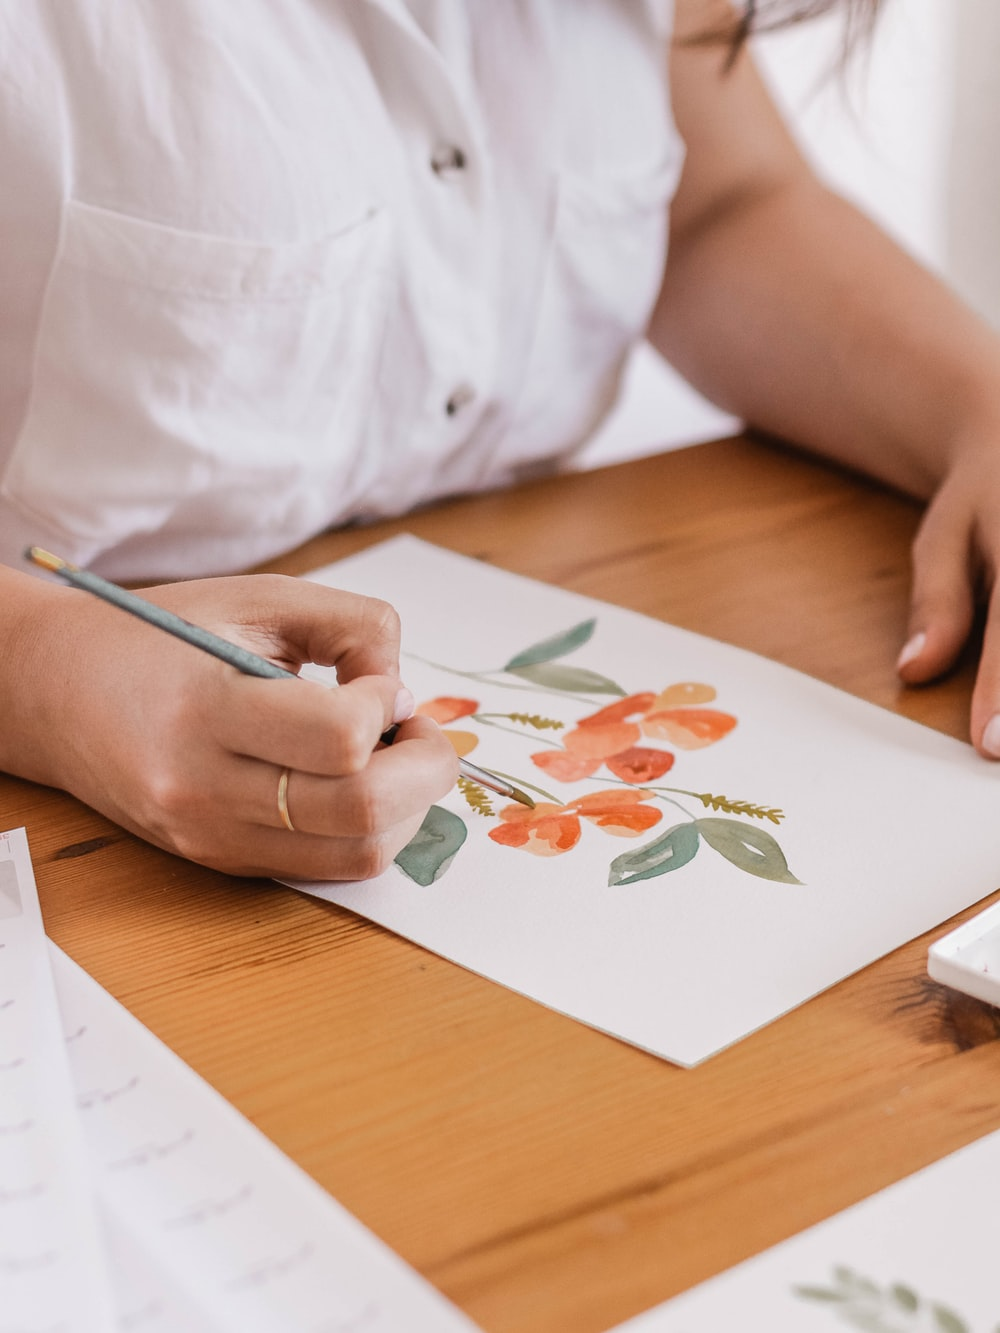 woman holding paint brush